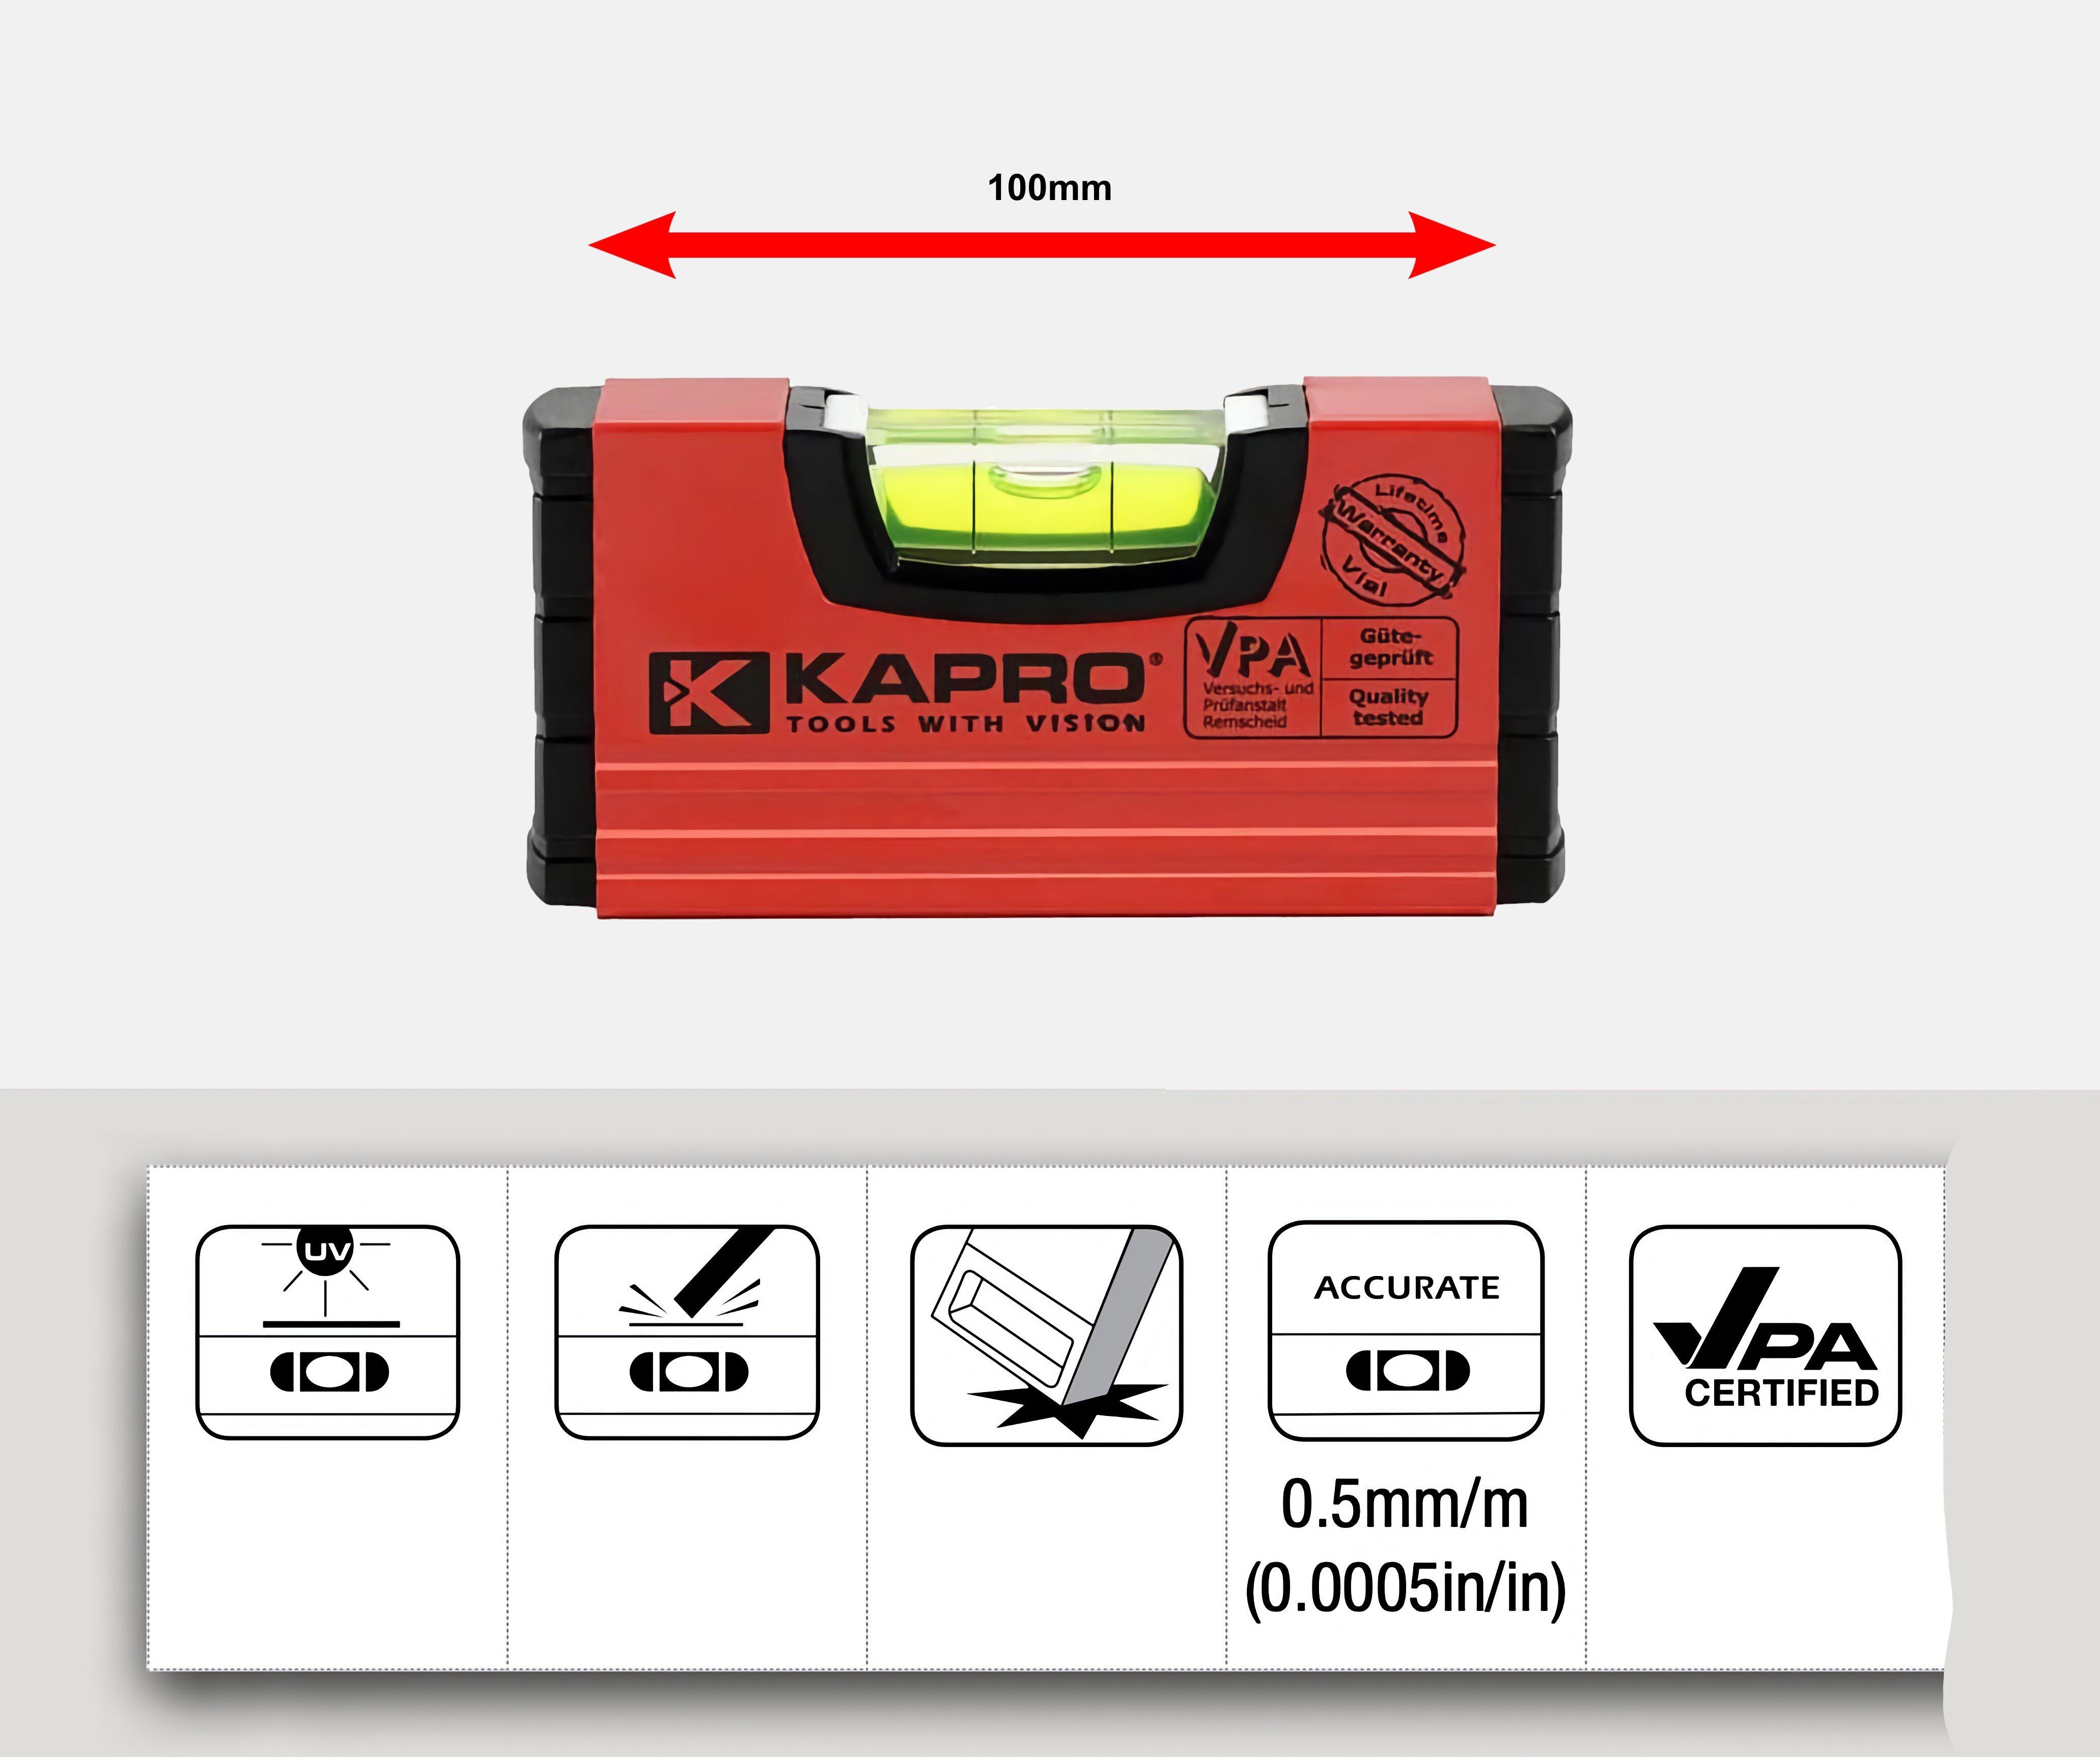 K246 KAPRO TOOLBOX HANDY LEVEL 10CM